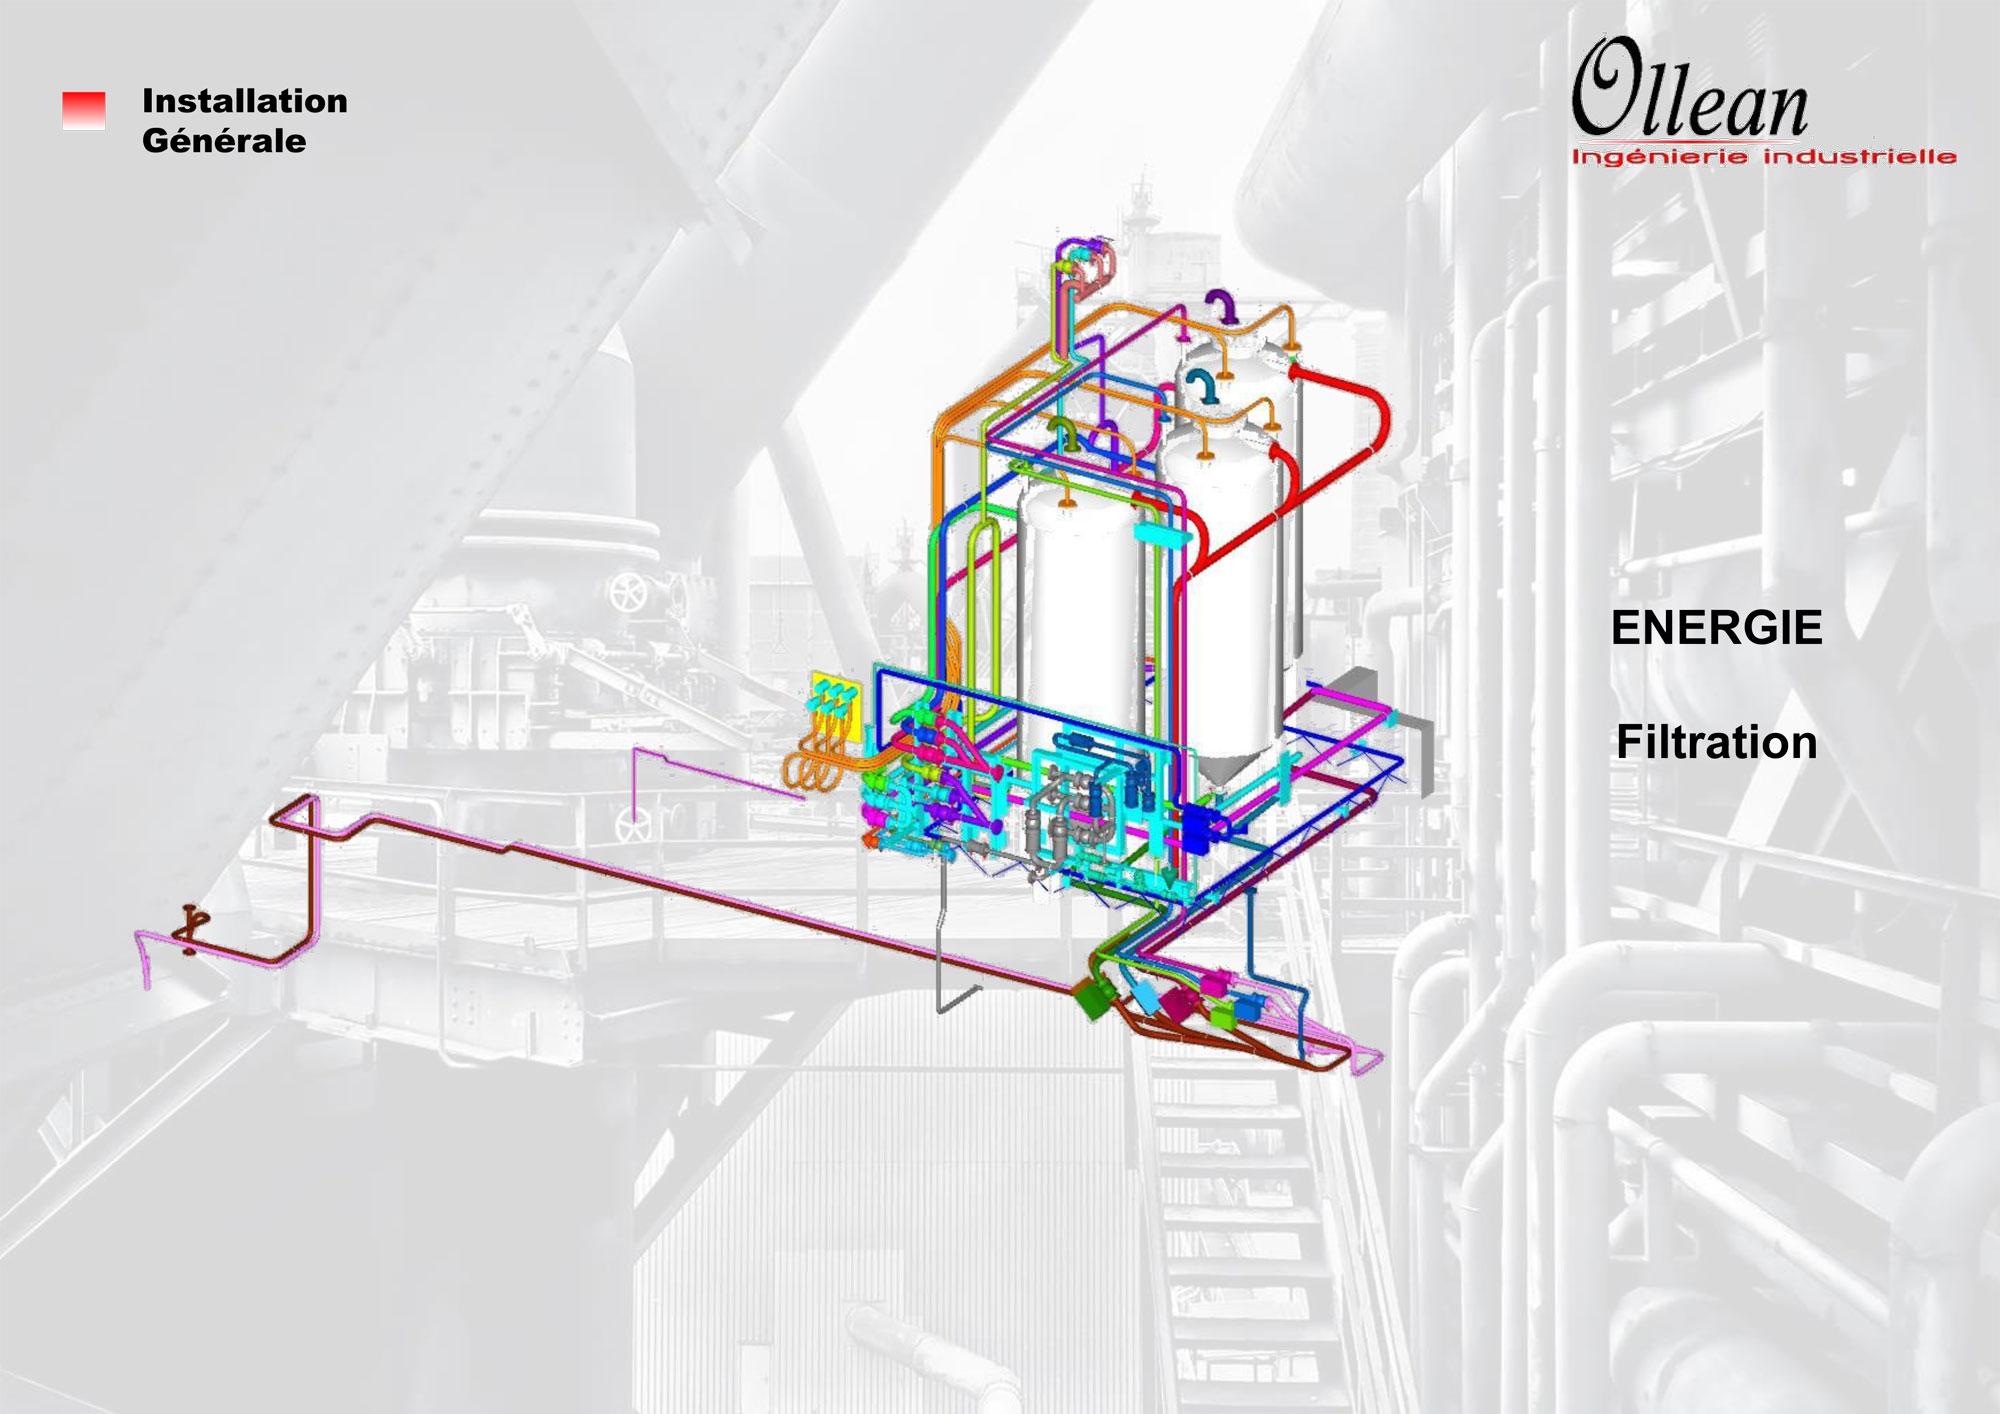 Installation générale - ENERGIE Filtration